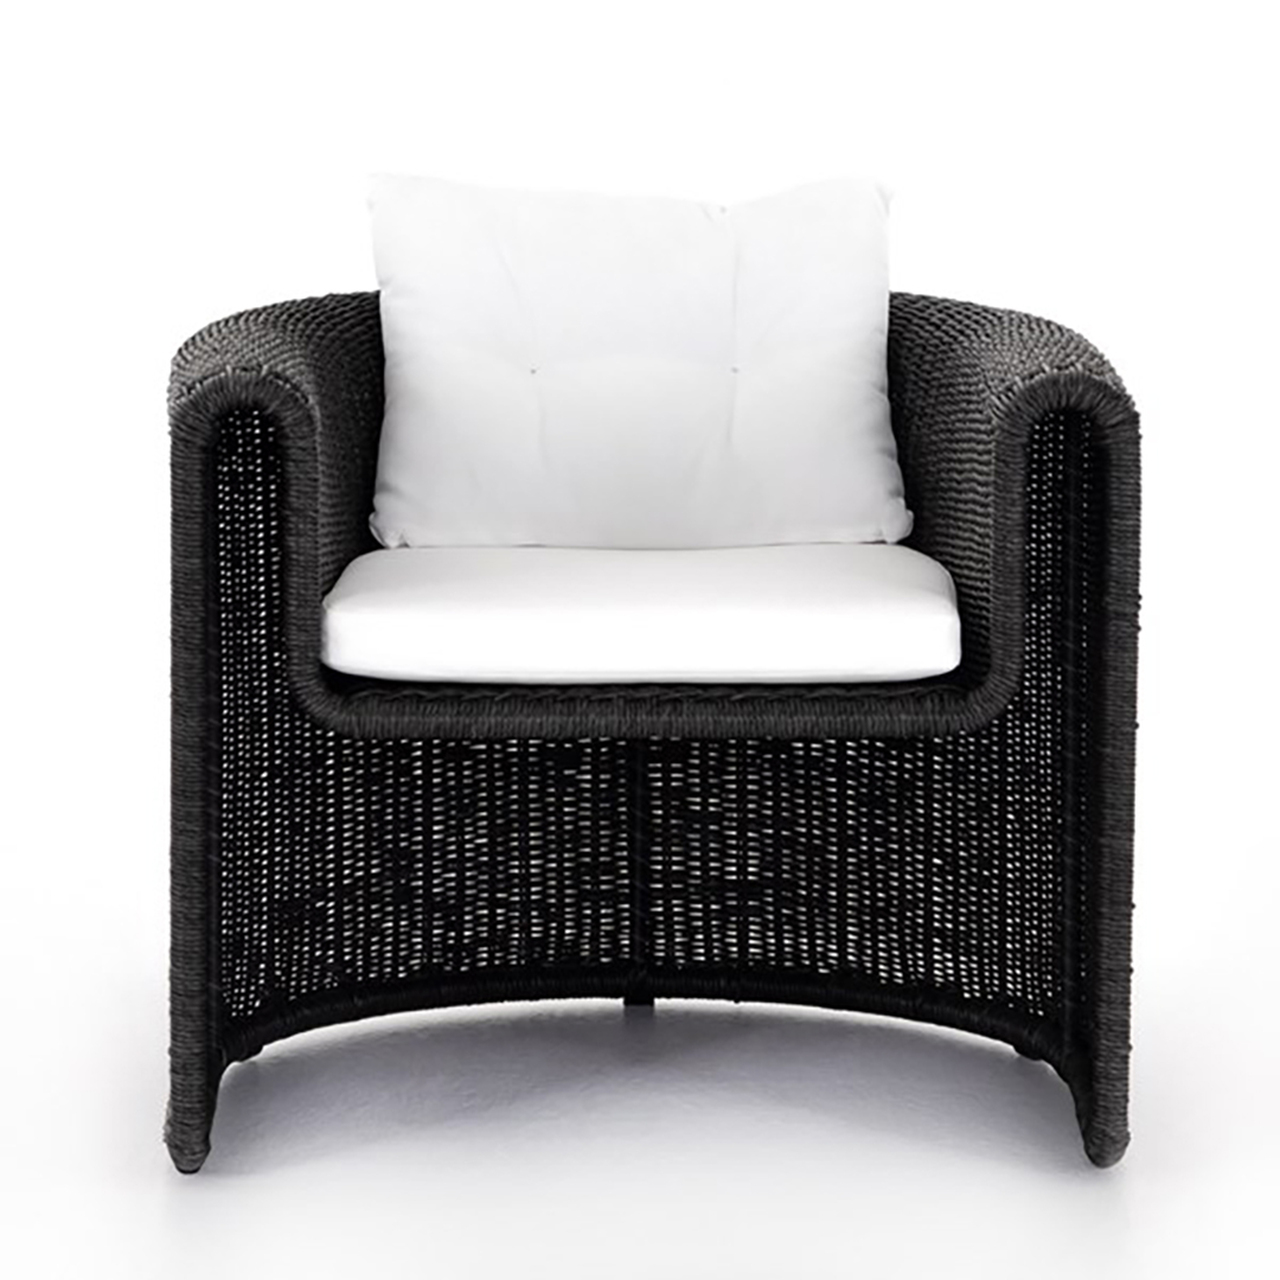 Tbilisi Woven Outdoor Chair